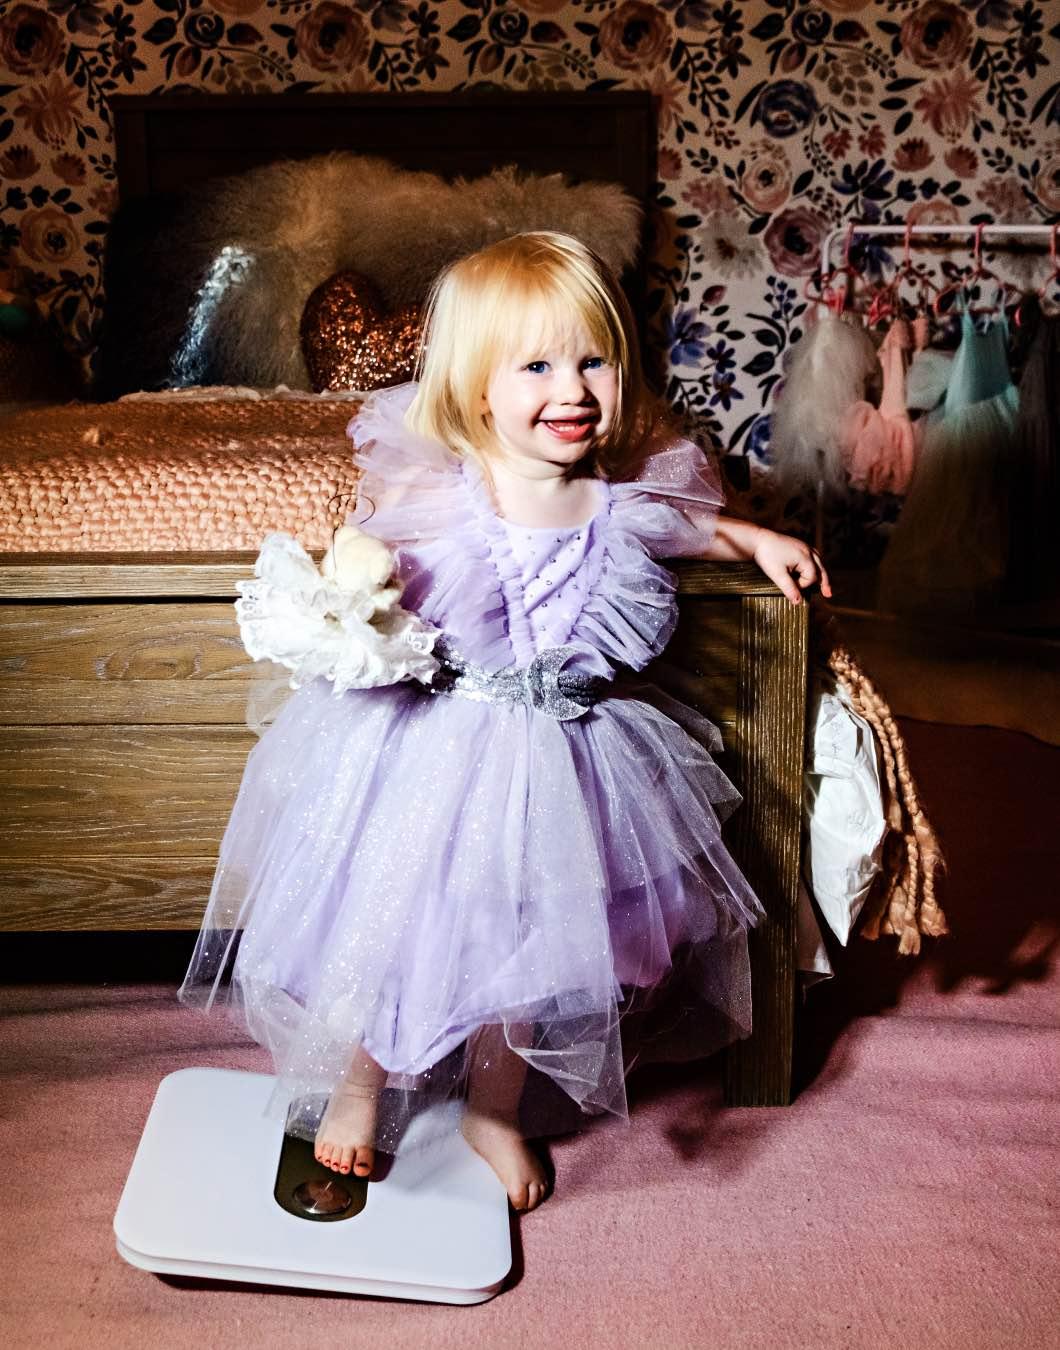 Transitioning to Toddler Room by Atlanta mom blogger Happily Hughes